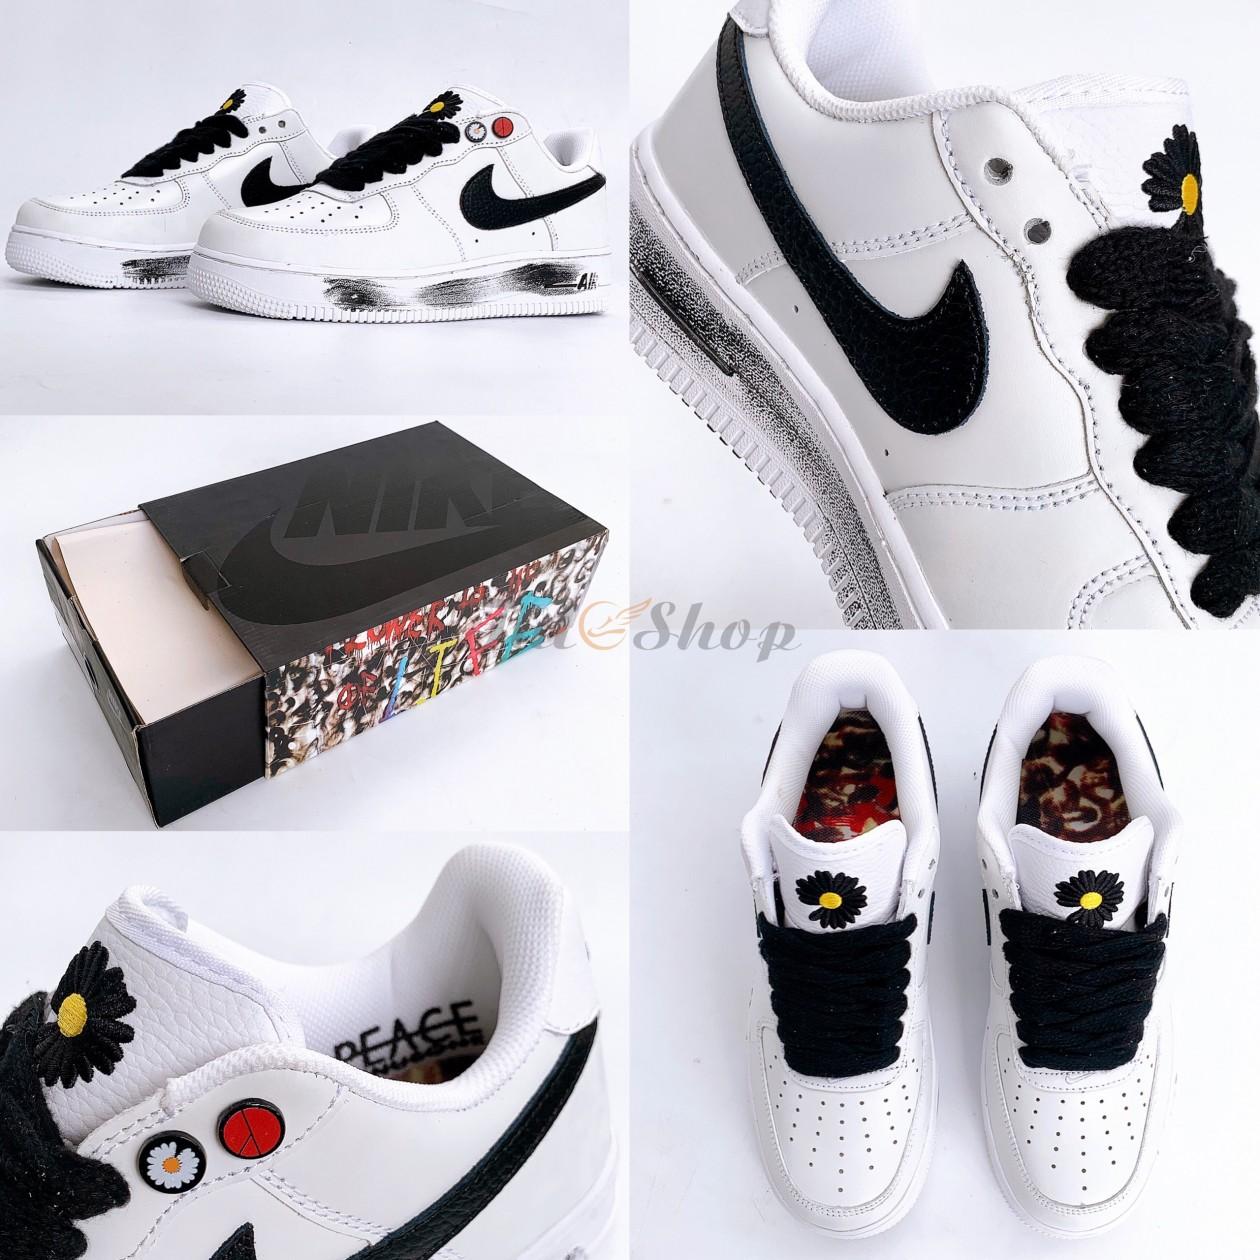 Nike Air Force 1 x G-Dragon Para Noise White 1:1